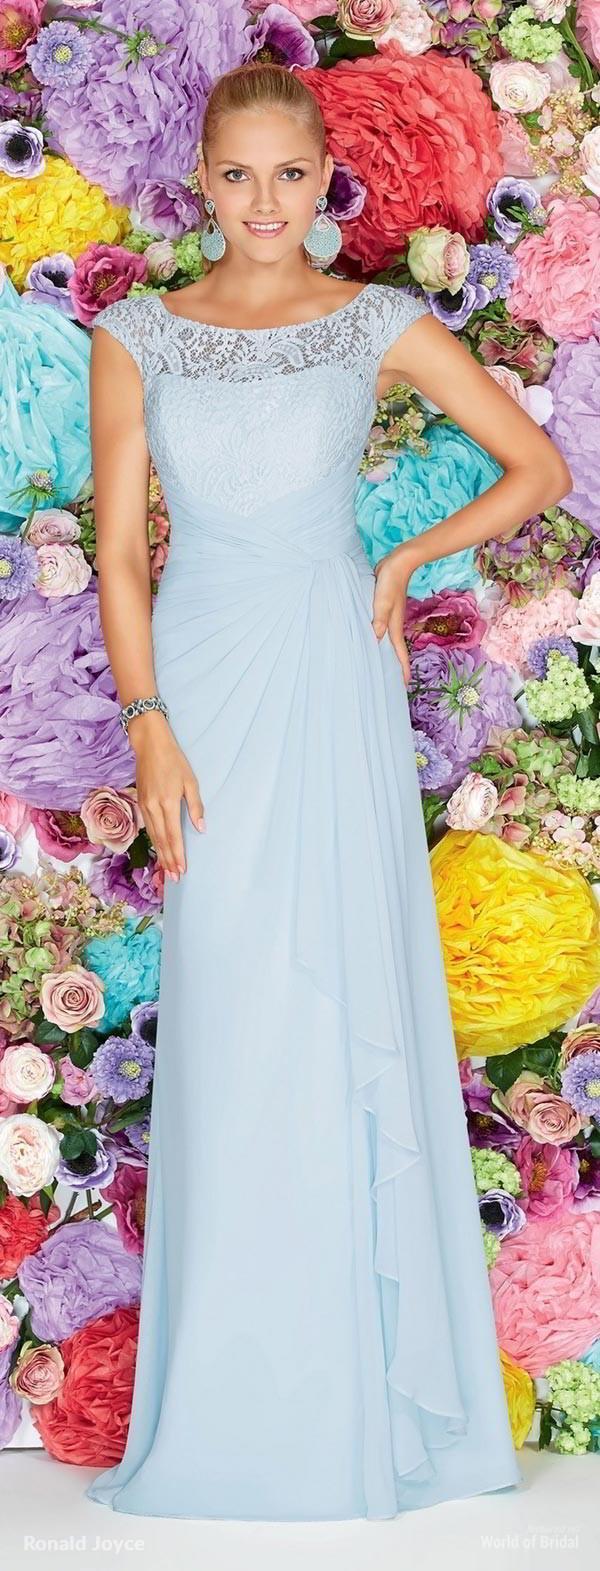 Boda - Ronald Joyce 2015 Bridesmaids Dresses